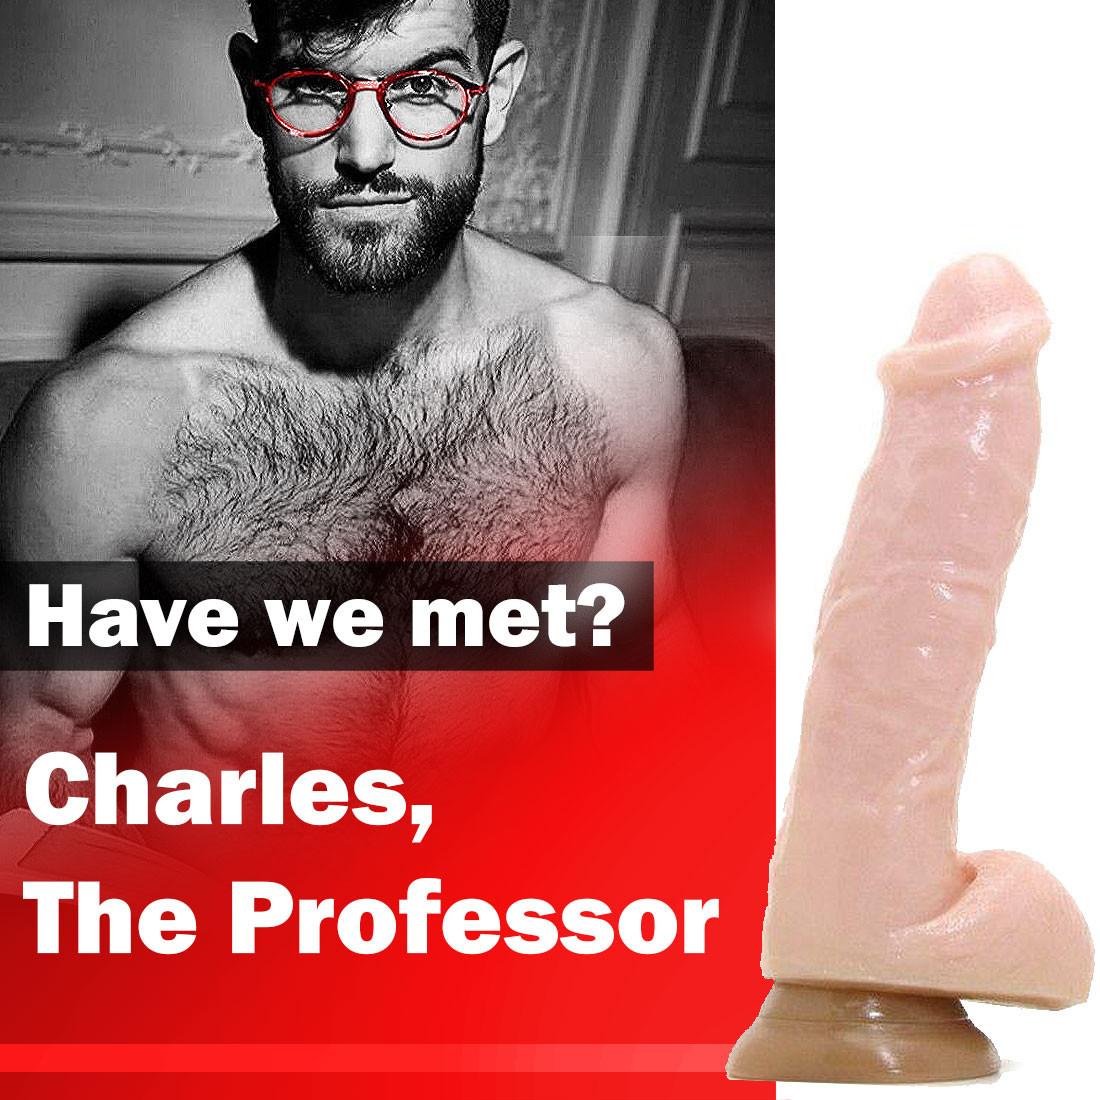 AVERAGE JOE Dildo: Charles - The Professor